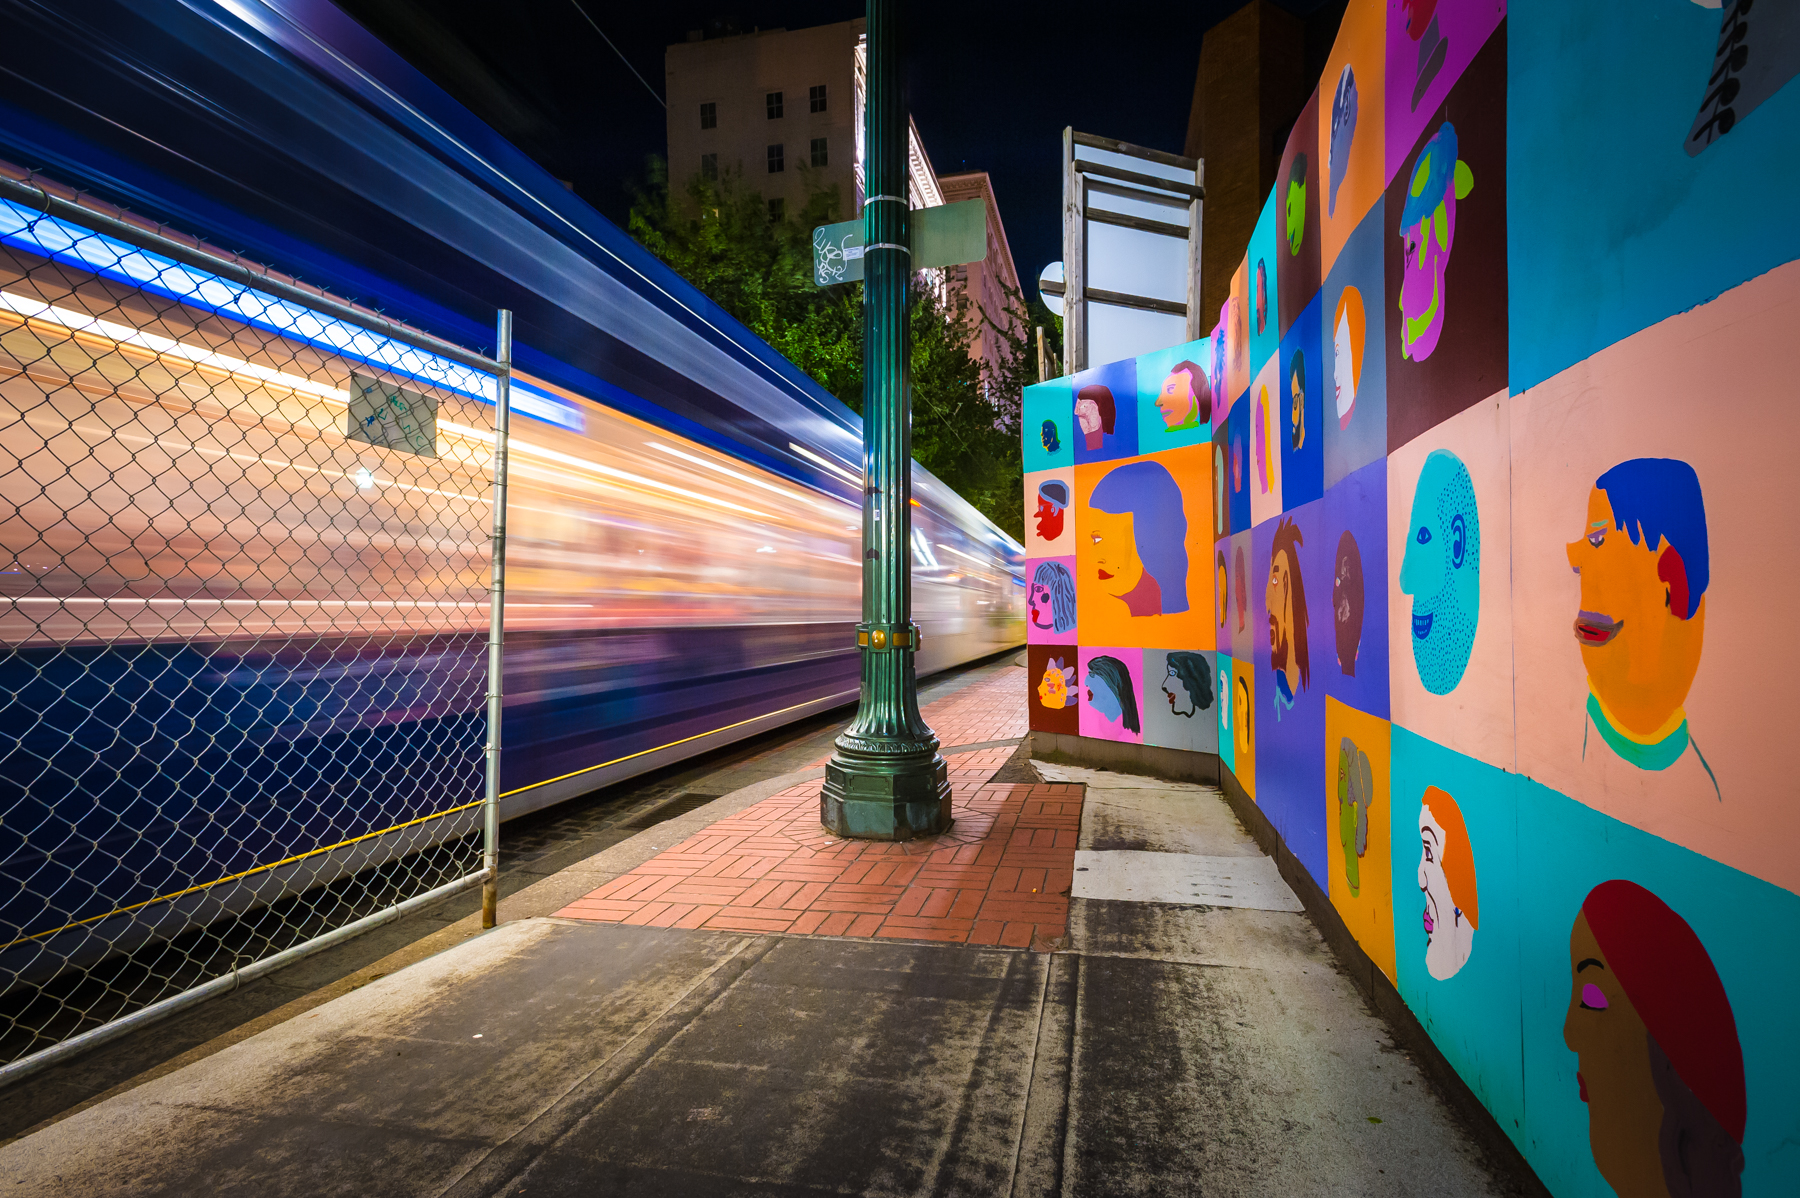 MAX Light Rail, Morrison St. Portland, OR 2013